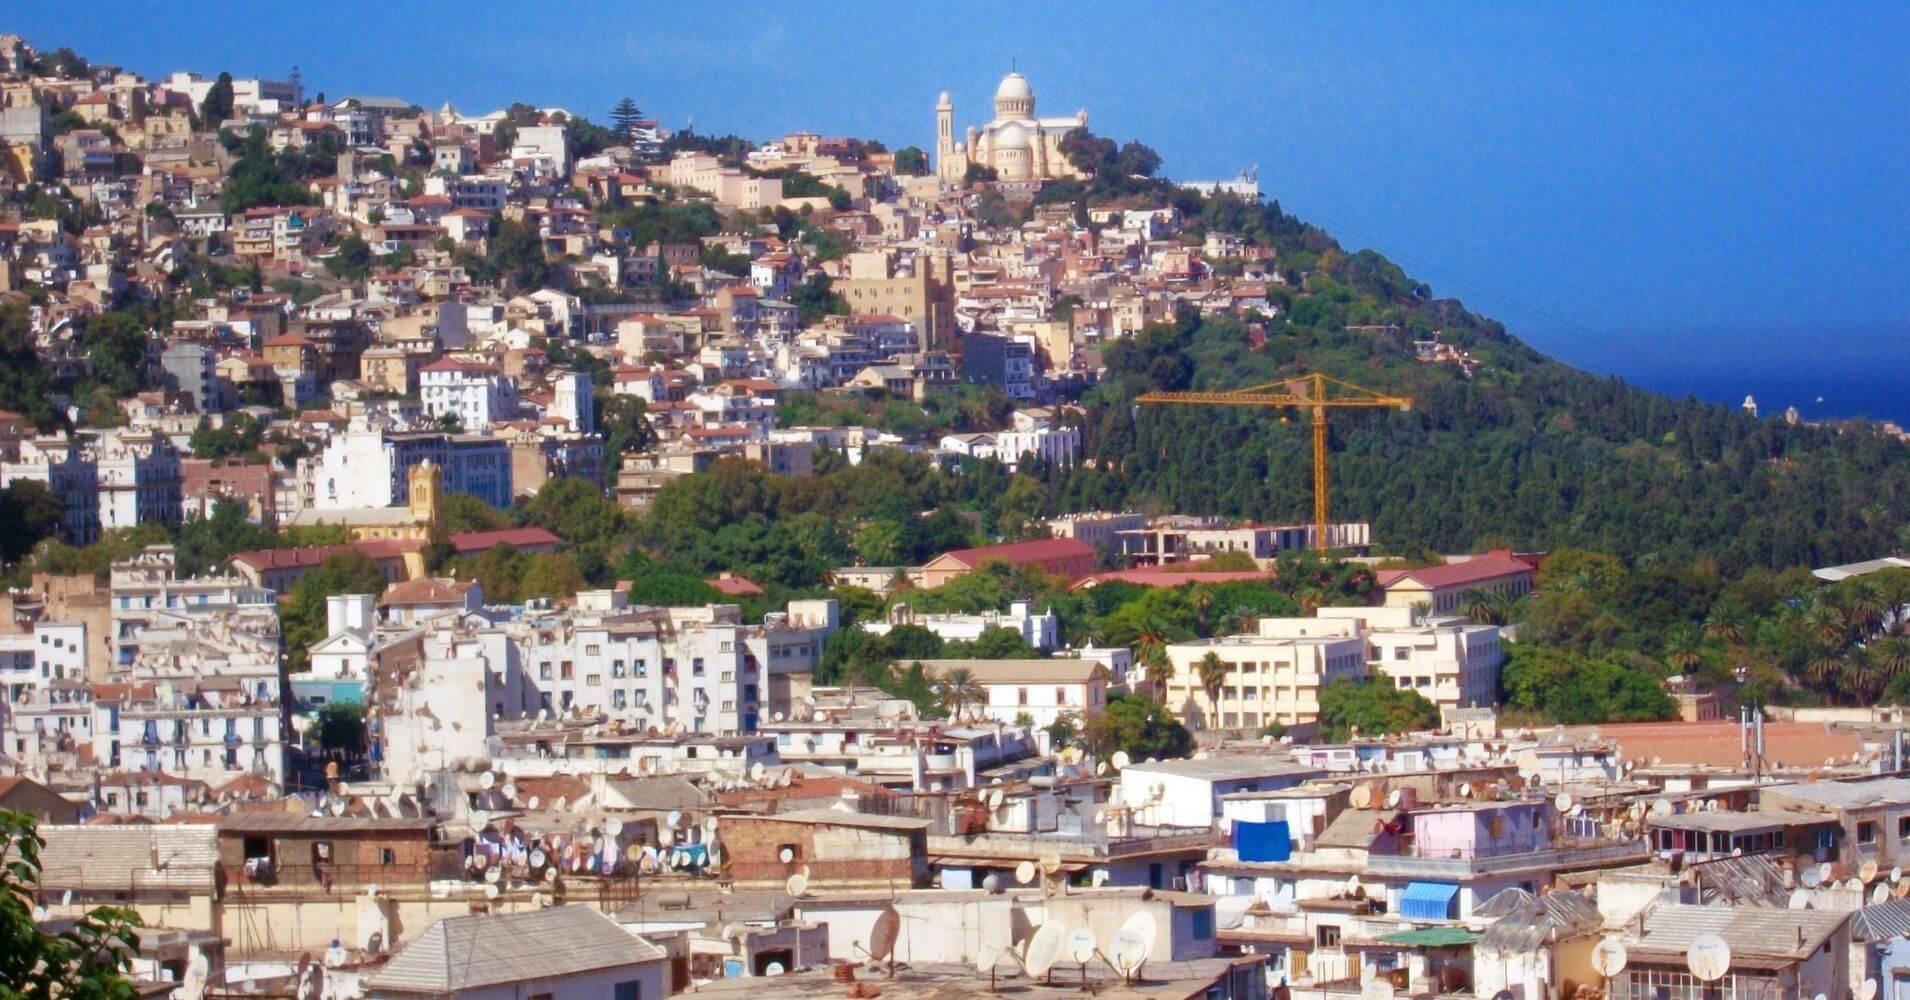 Panorámica de Argel la Blanca. Argelia.